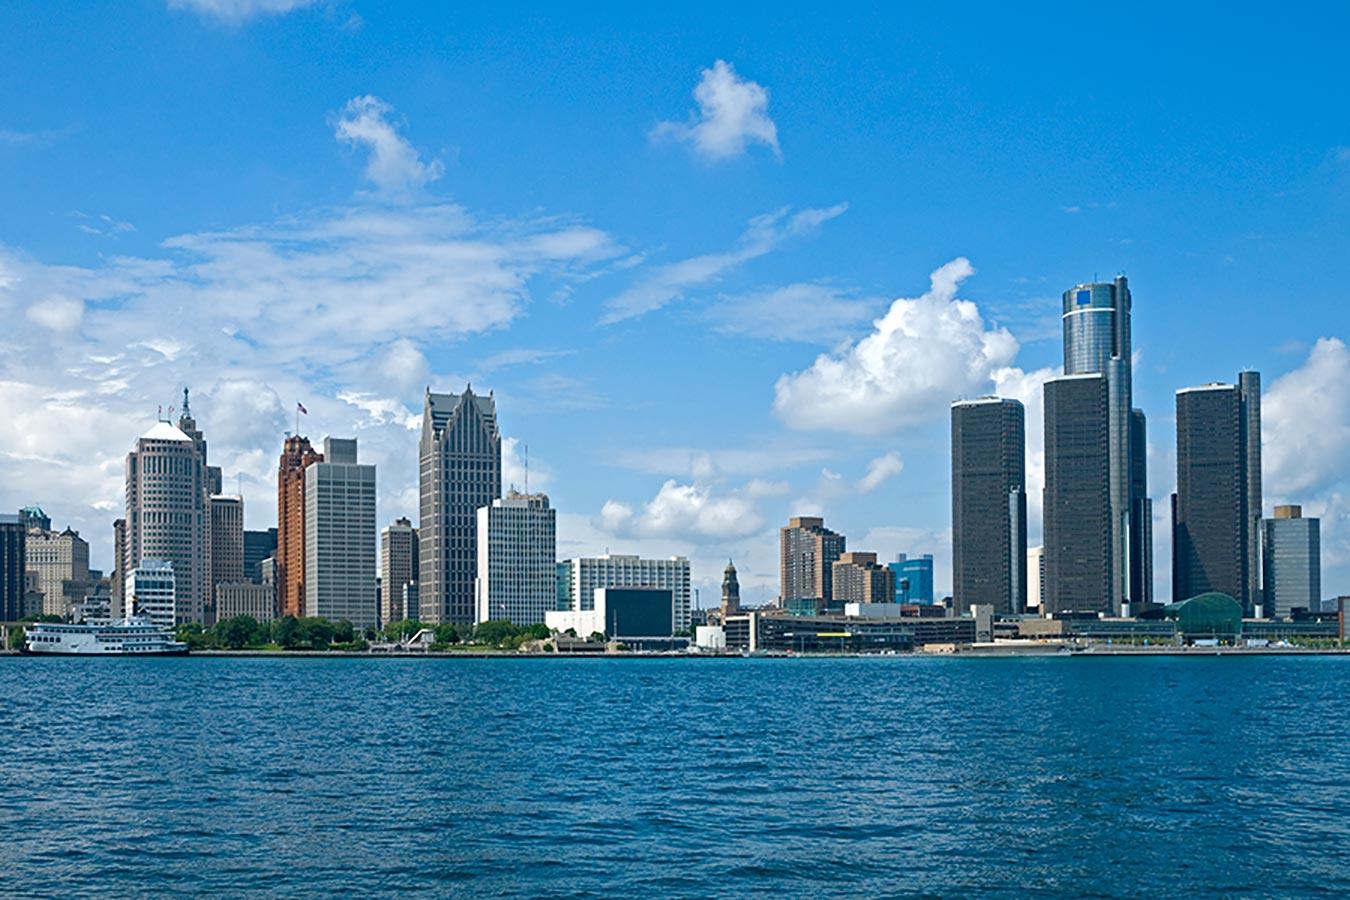 https://secureservercdn.net/50.62.172.232/j4y.c53.myftpupload.com/wp-content/uploads/2018/12/Detroit-Michigan-Skyline.jpg?time=1585884550